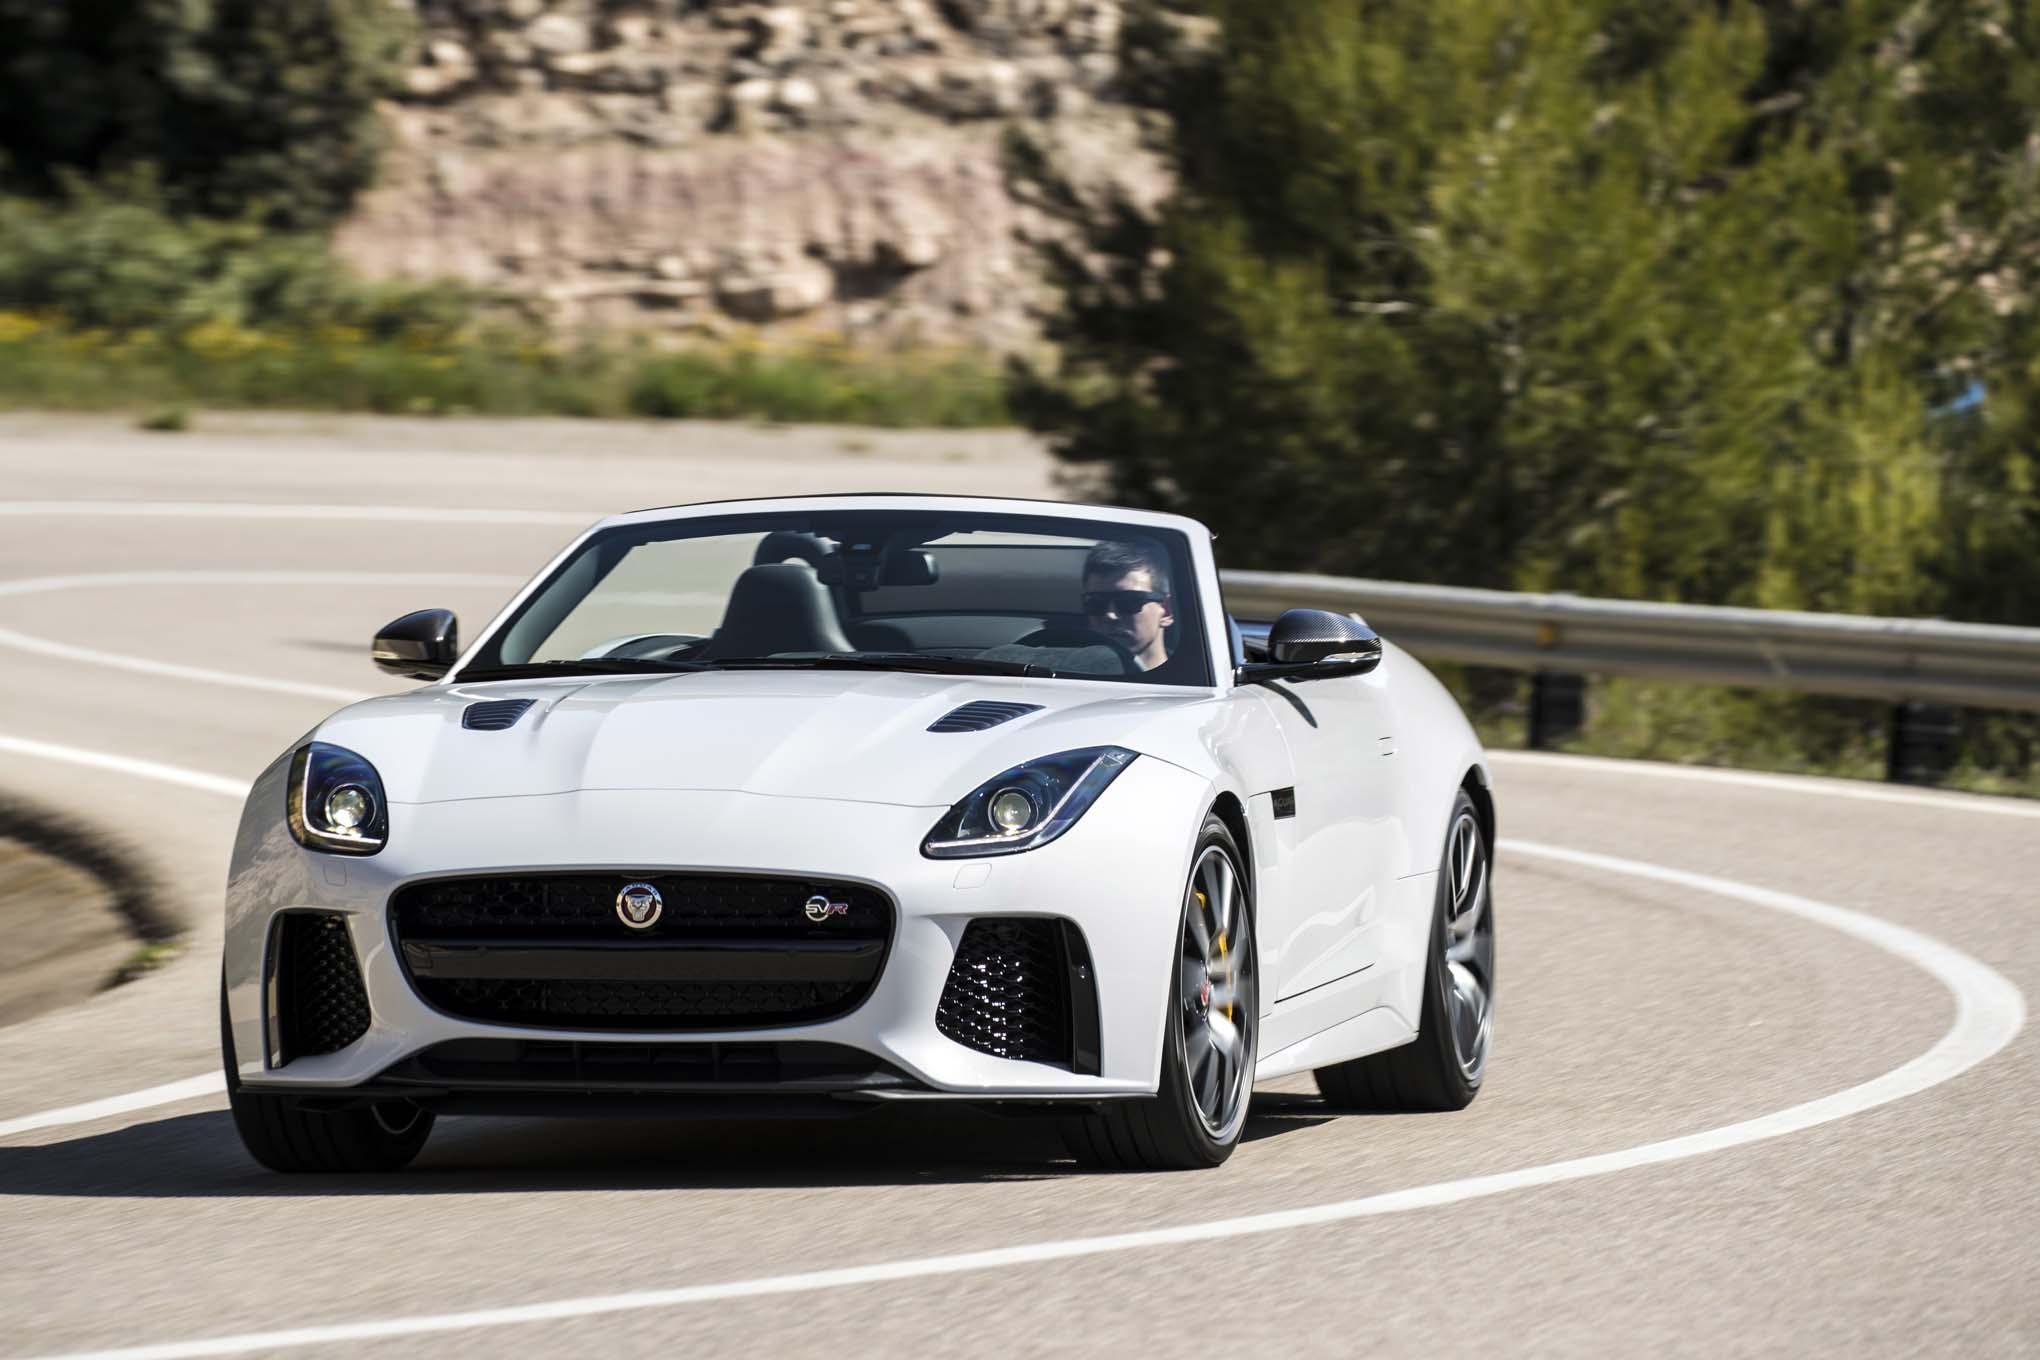 2017 jaguar f type svr first drive review automobile magazine. Black Bedroom Furniture Sets. Home Design Ideas